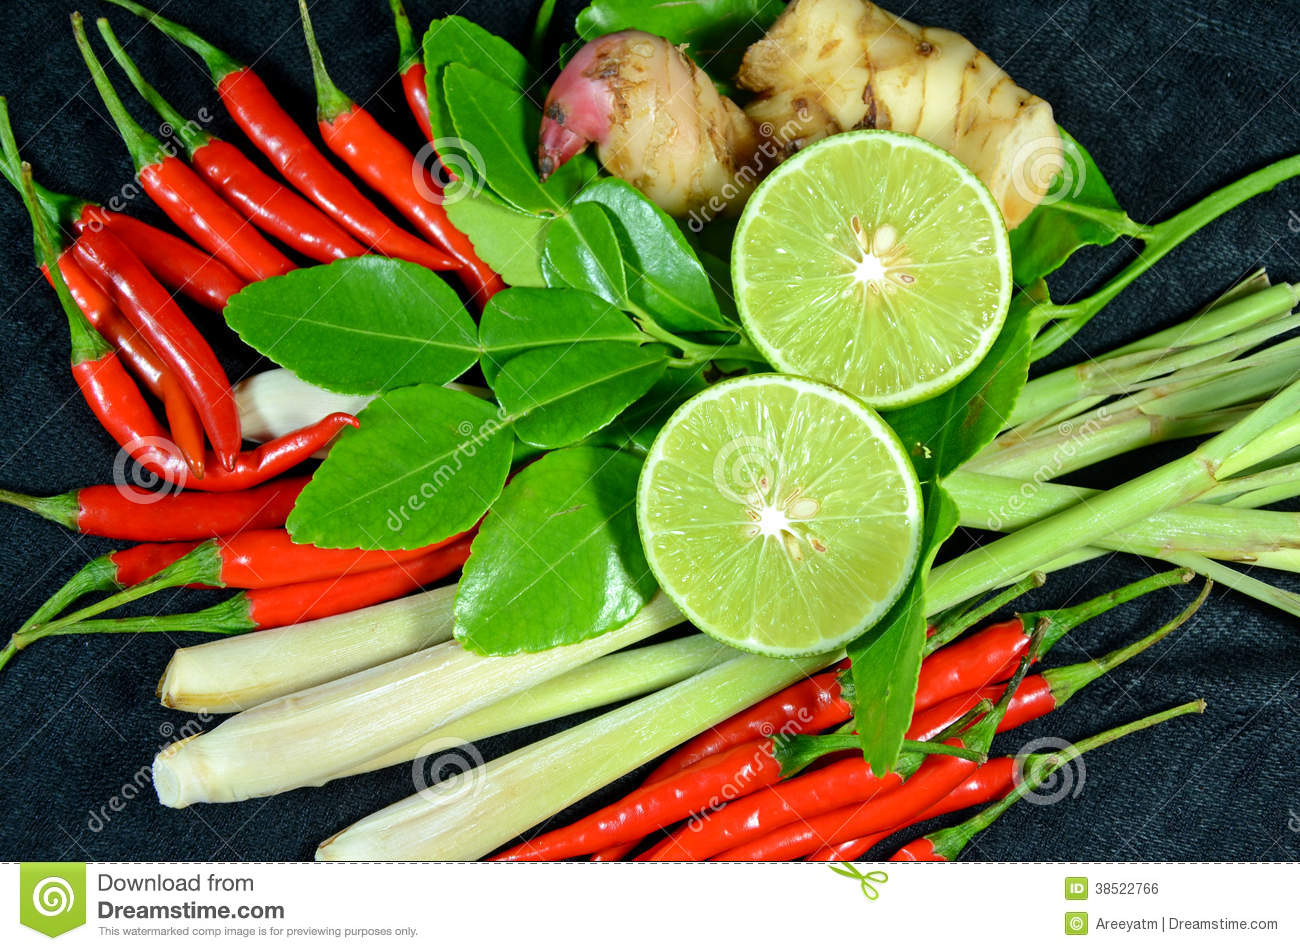 kruiden-voor-thaise-kruidige-citroengrassoep-38522766